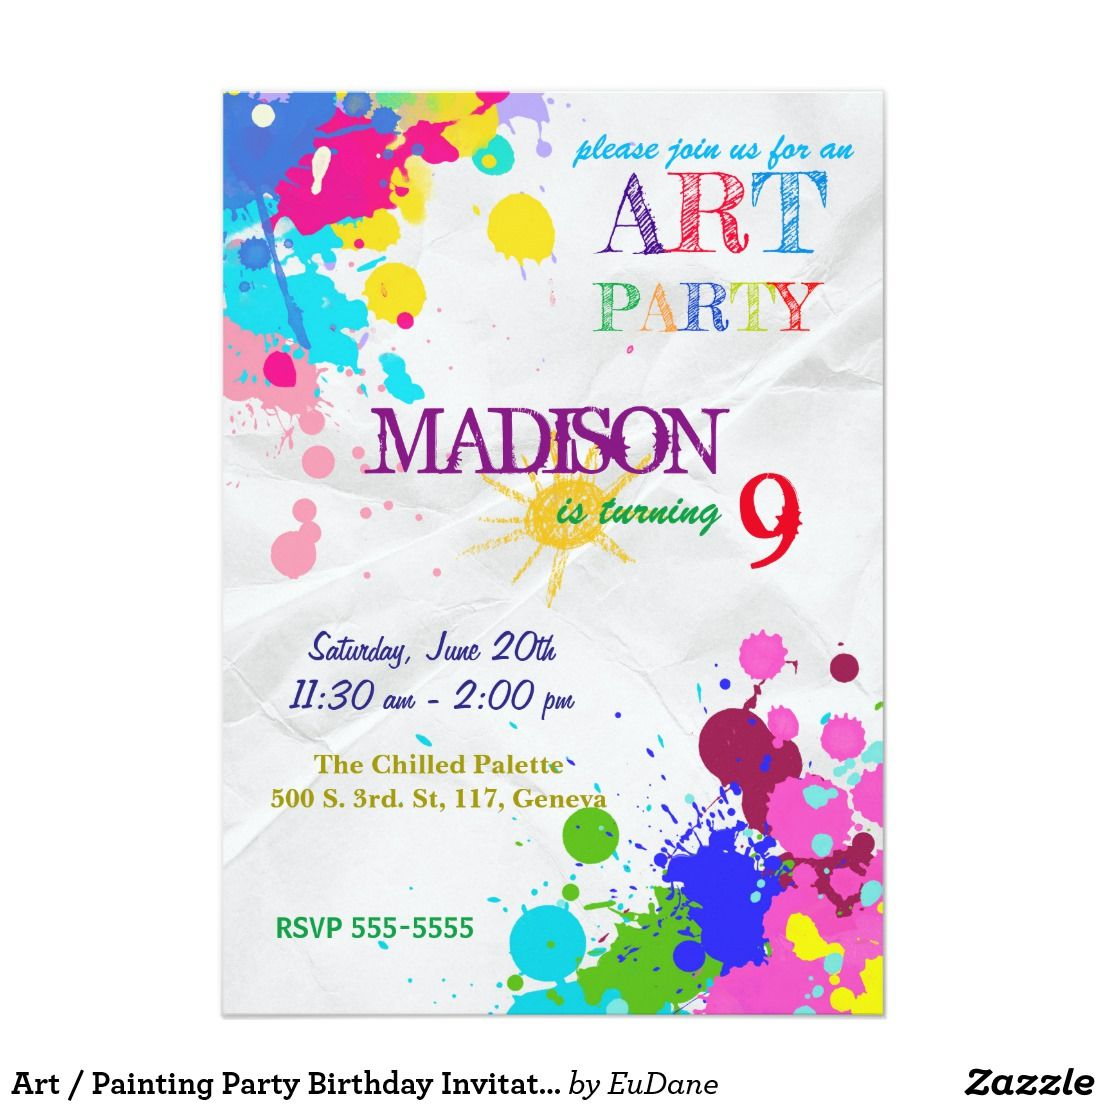 Art / Painting Party Birthday Invitation | Pinterest